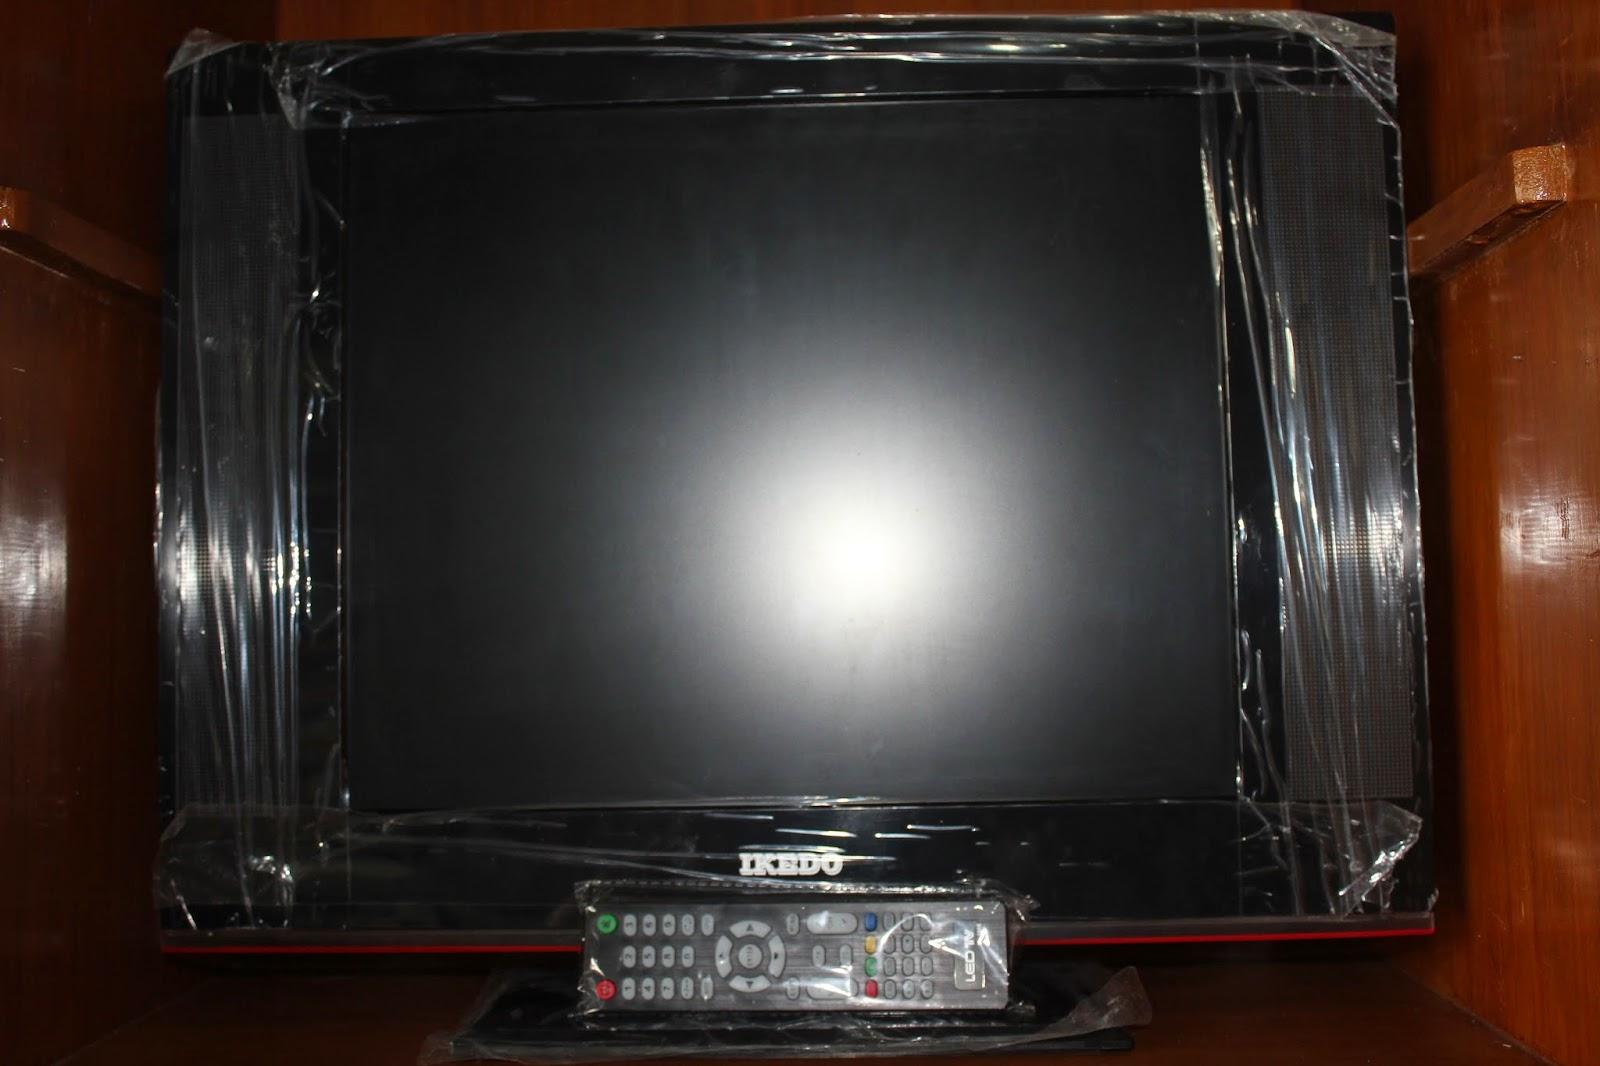 Ikedo Led Tv 15 Inch Daftar Harga Termurah Dan Terlengkap 32 M1a Dolby Surround Sytema Hitam Gratis Powerstrip Huntkey Sga301 Source Lcdtv 20in